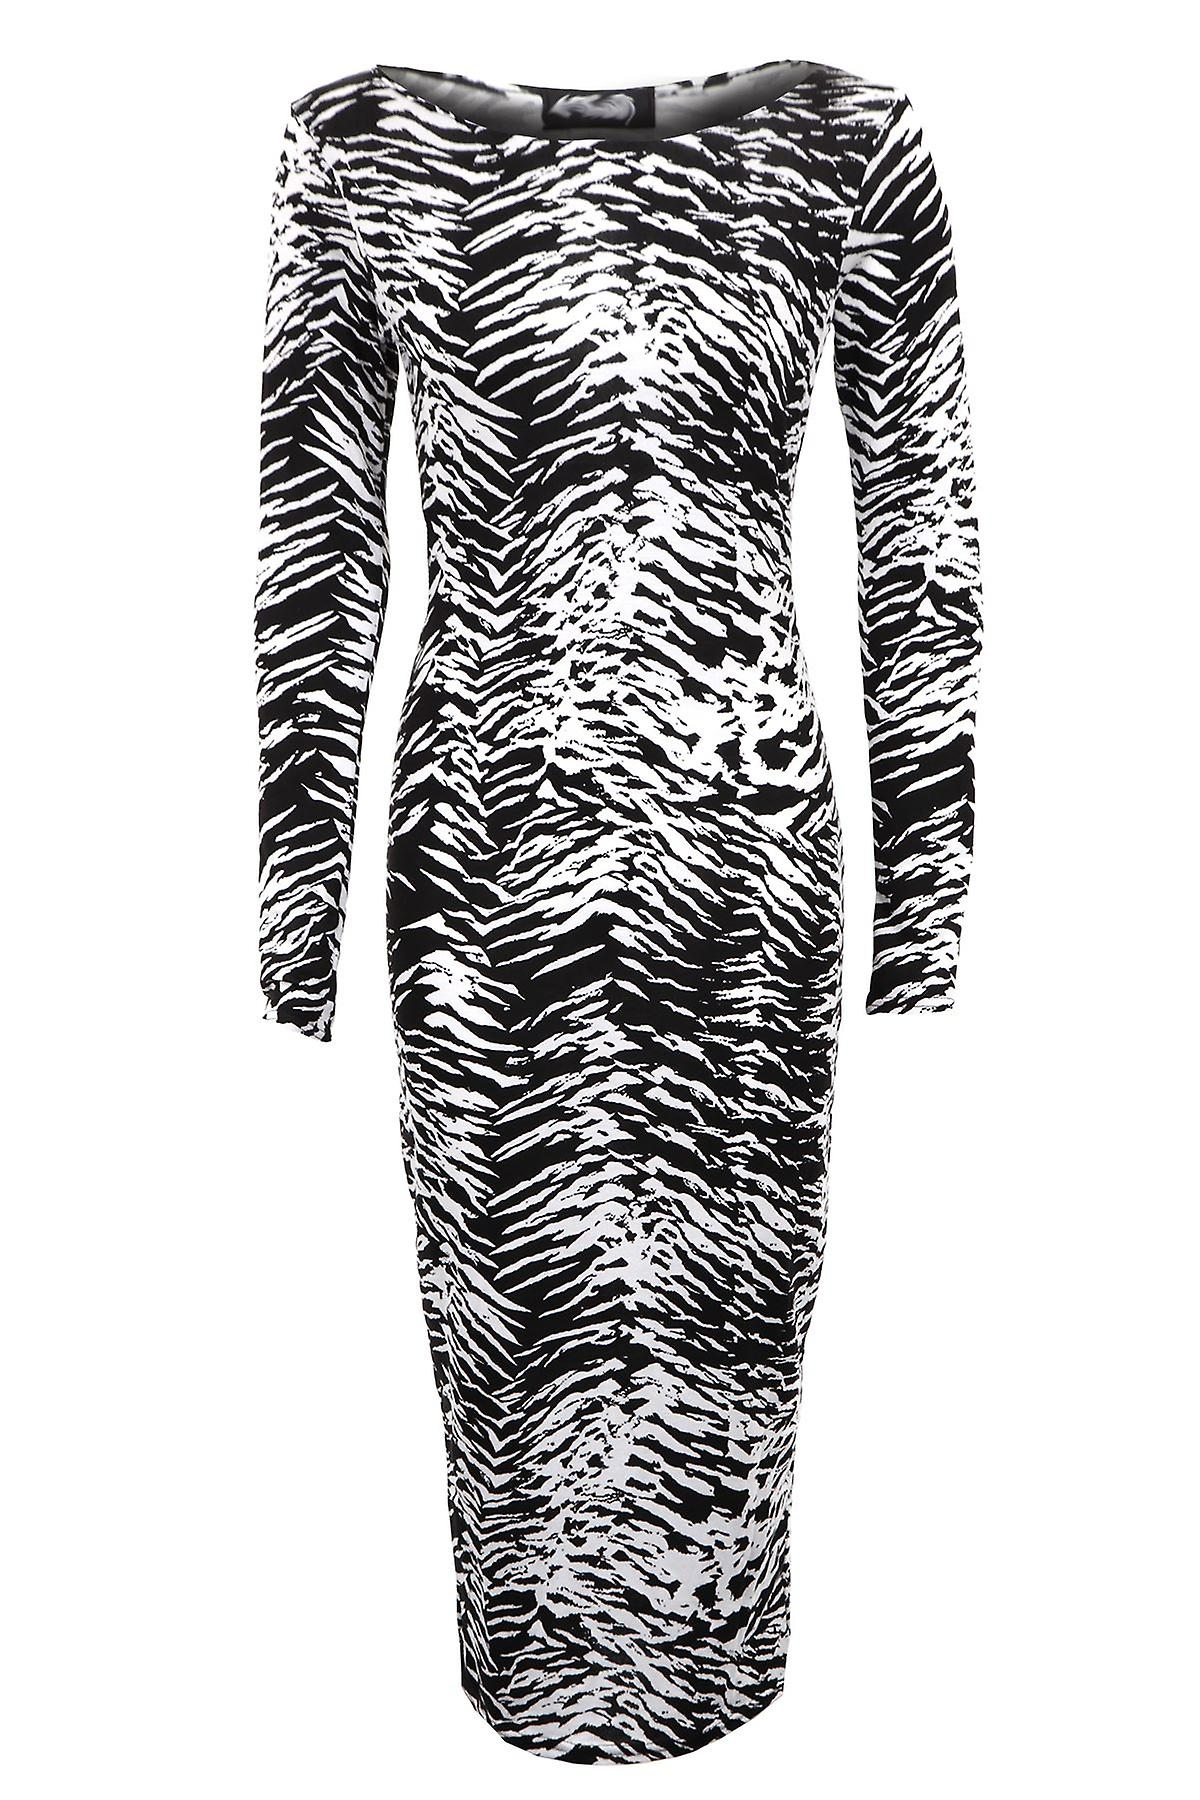 New Ladies Celeb Tribal Zebra Print Full Length Bodycon Women's Dress